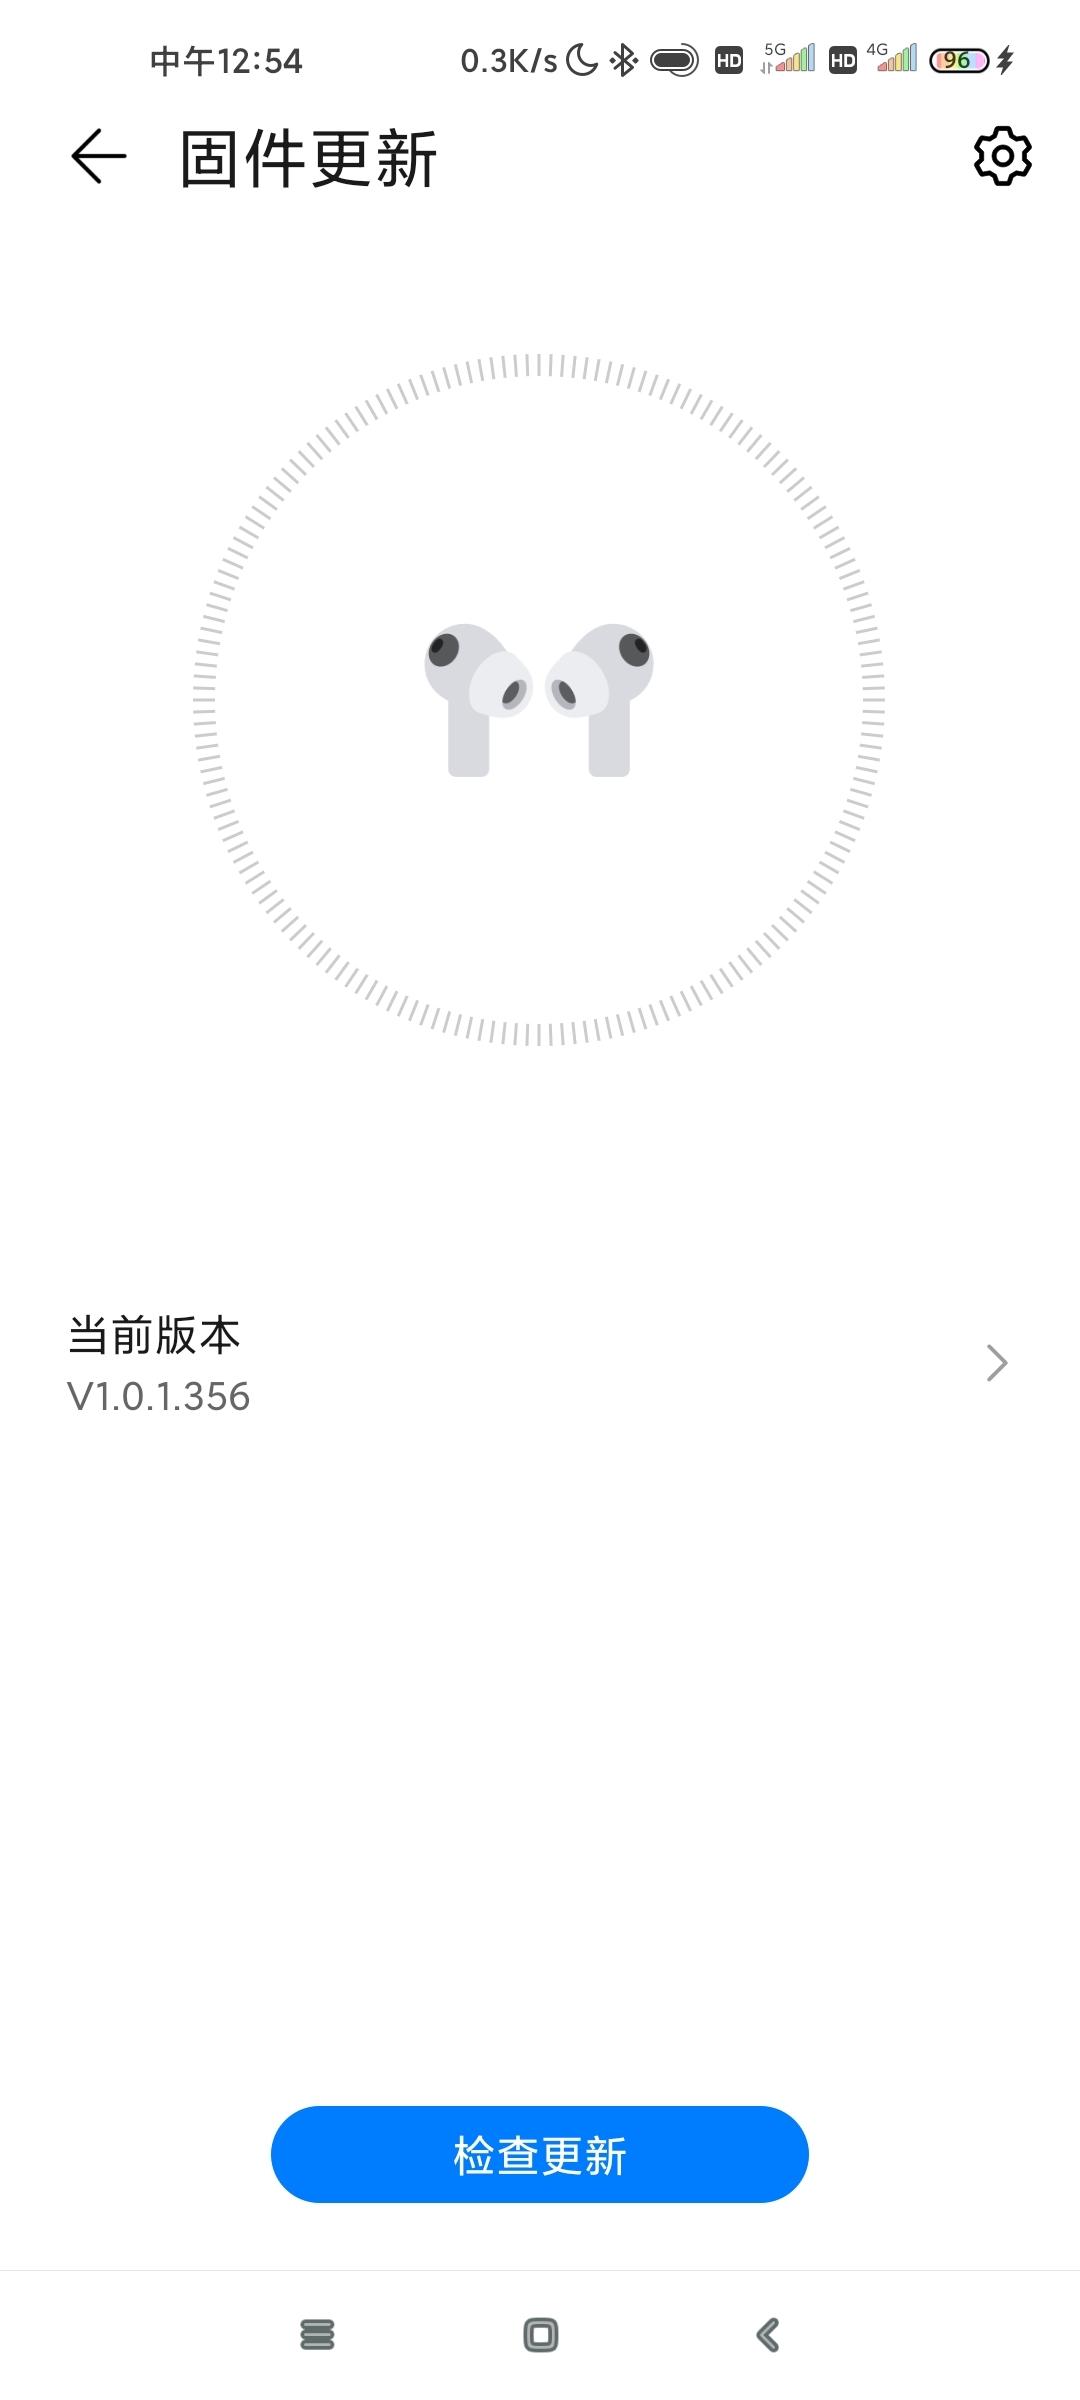 Screenshot_2021-03-29-12-54-20-790_com.huawei.smarthome.jpg